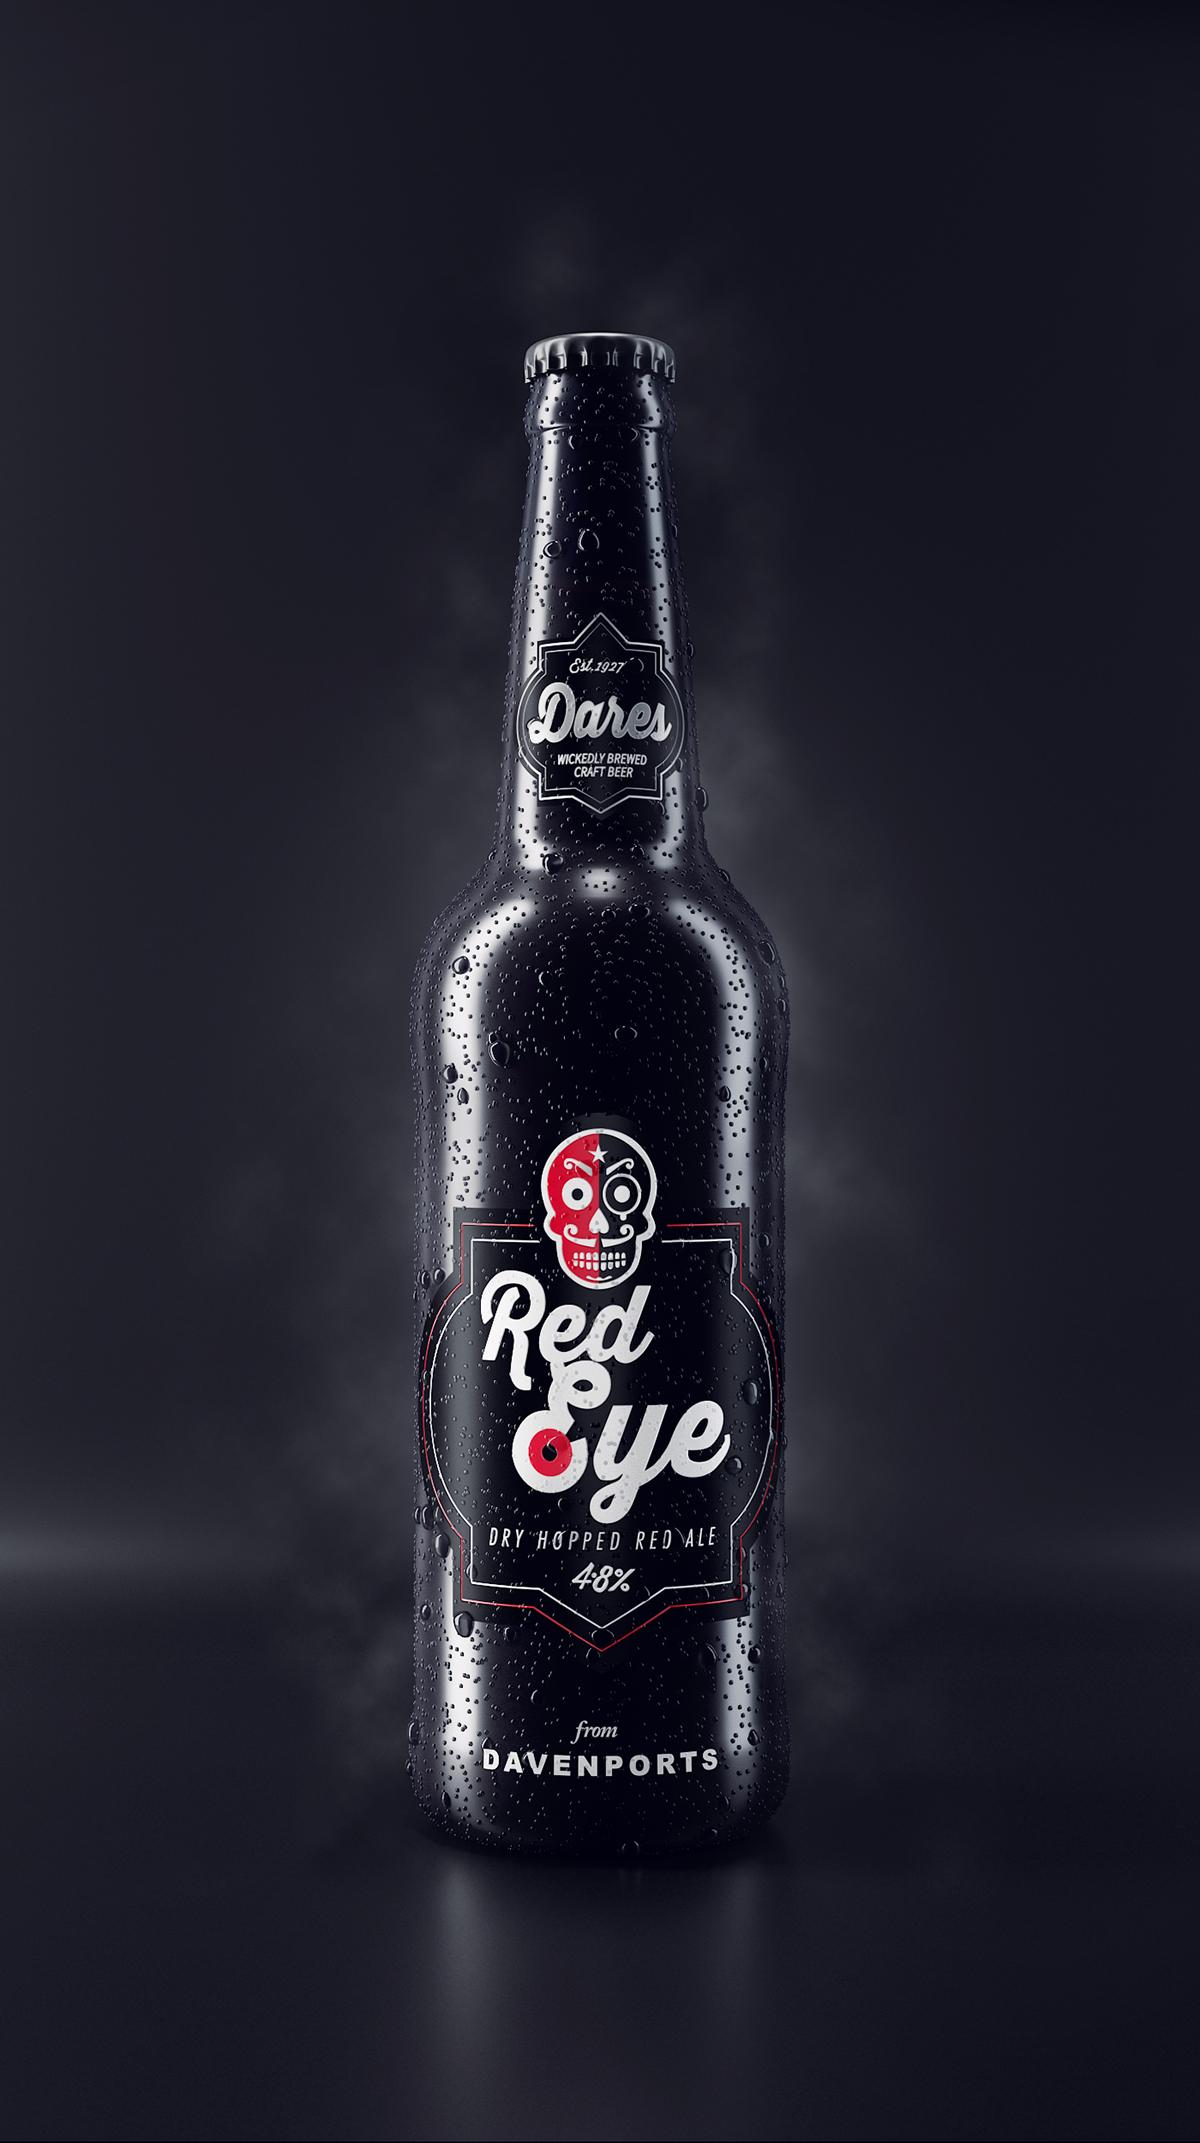 Davenports dares beer be beverages CGI bottle 3dsmax vray UK